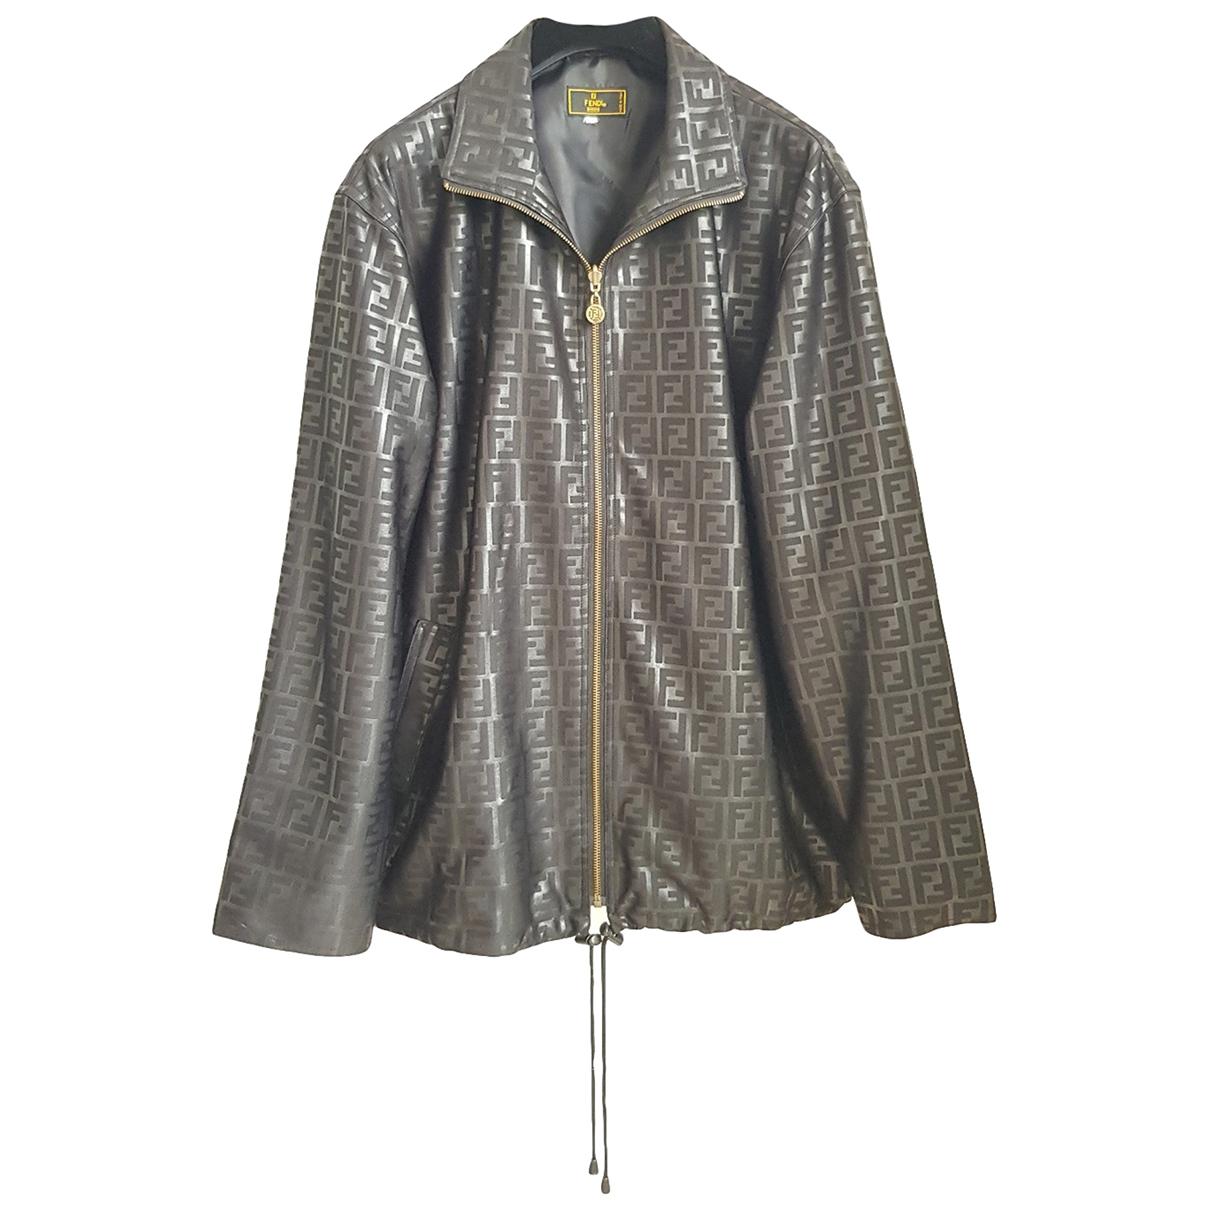 Fendi \N Black jacket for Women L International